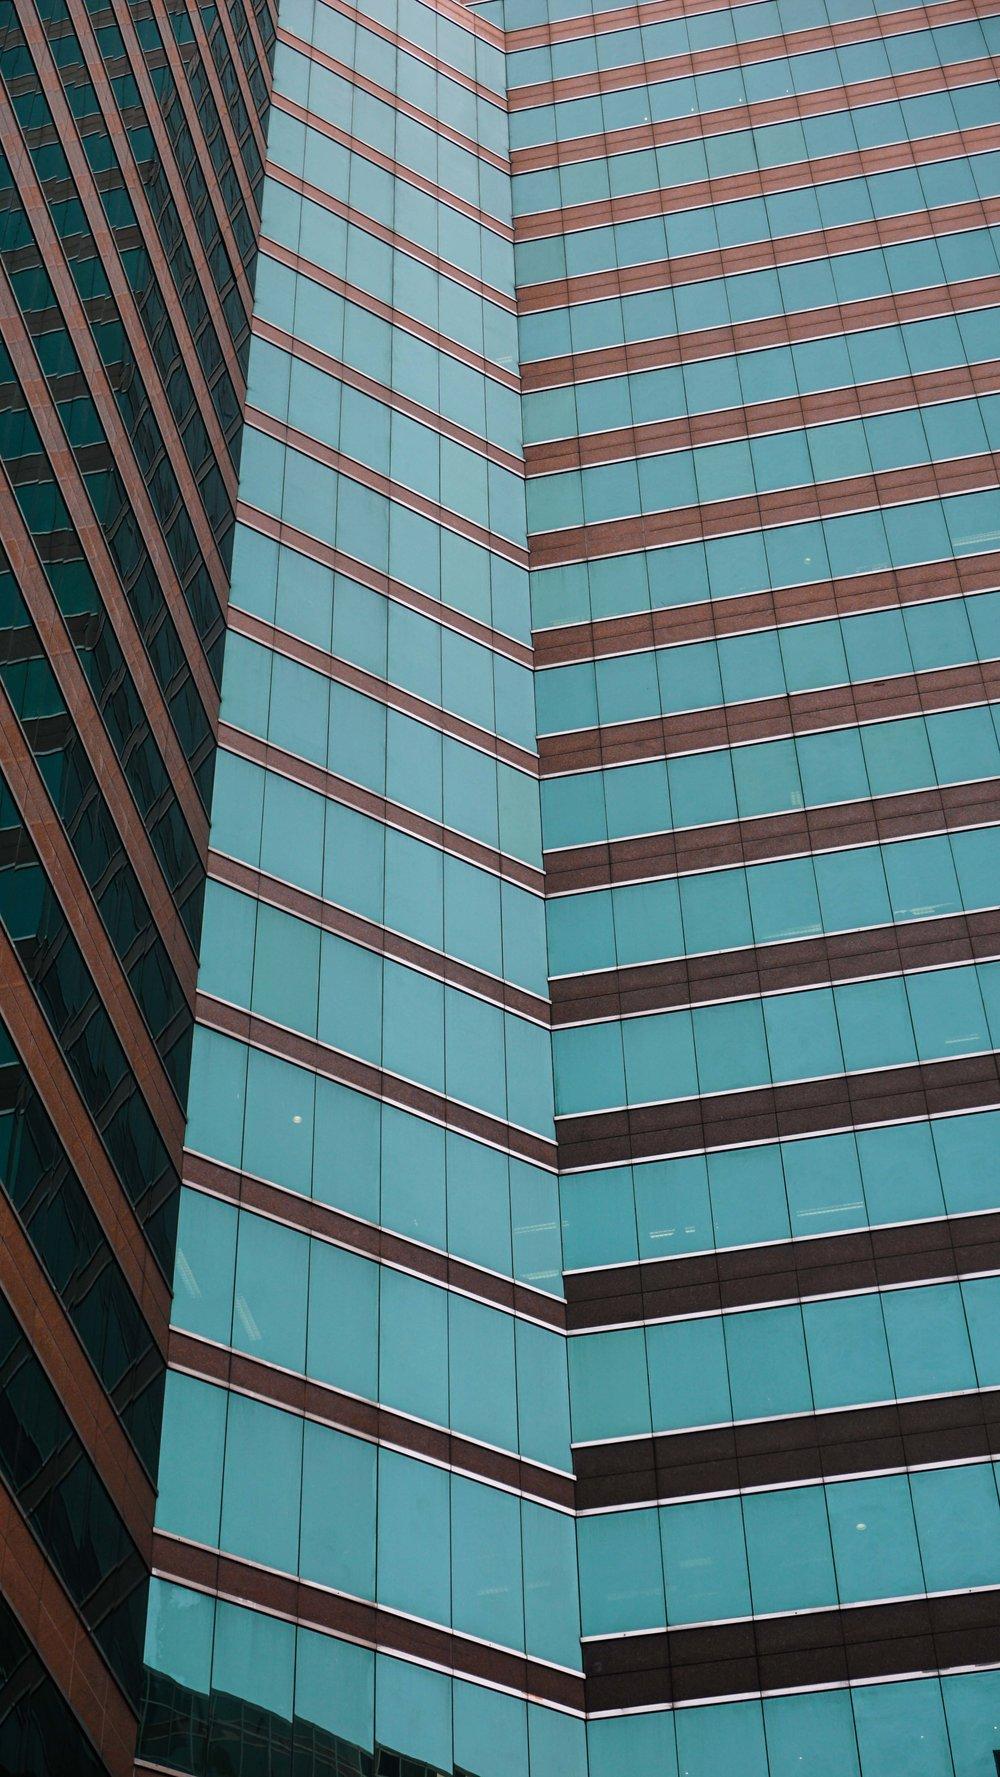 pol_tarres_adventures_honk_kong_verticals-04.jpg